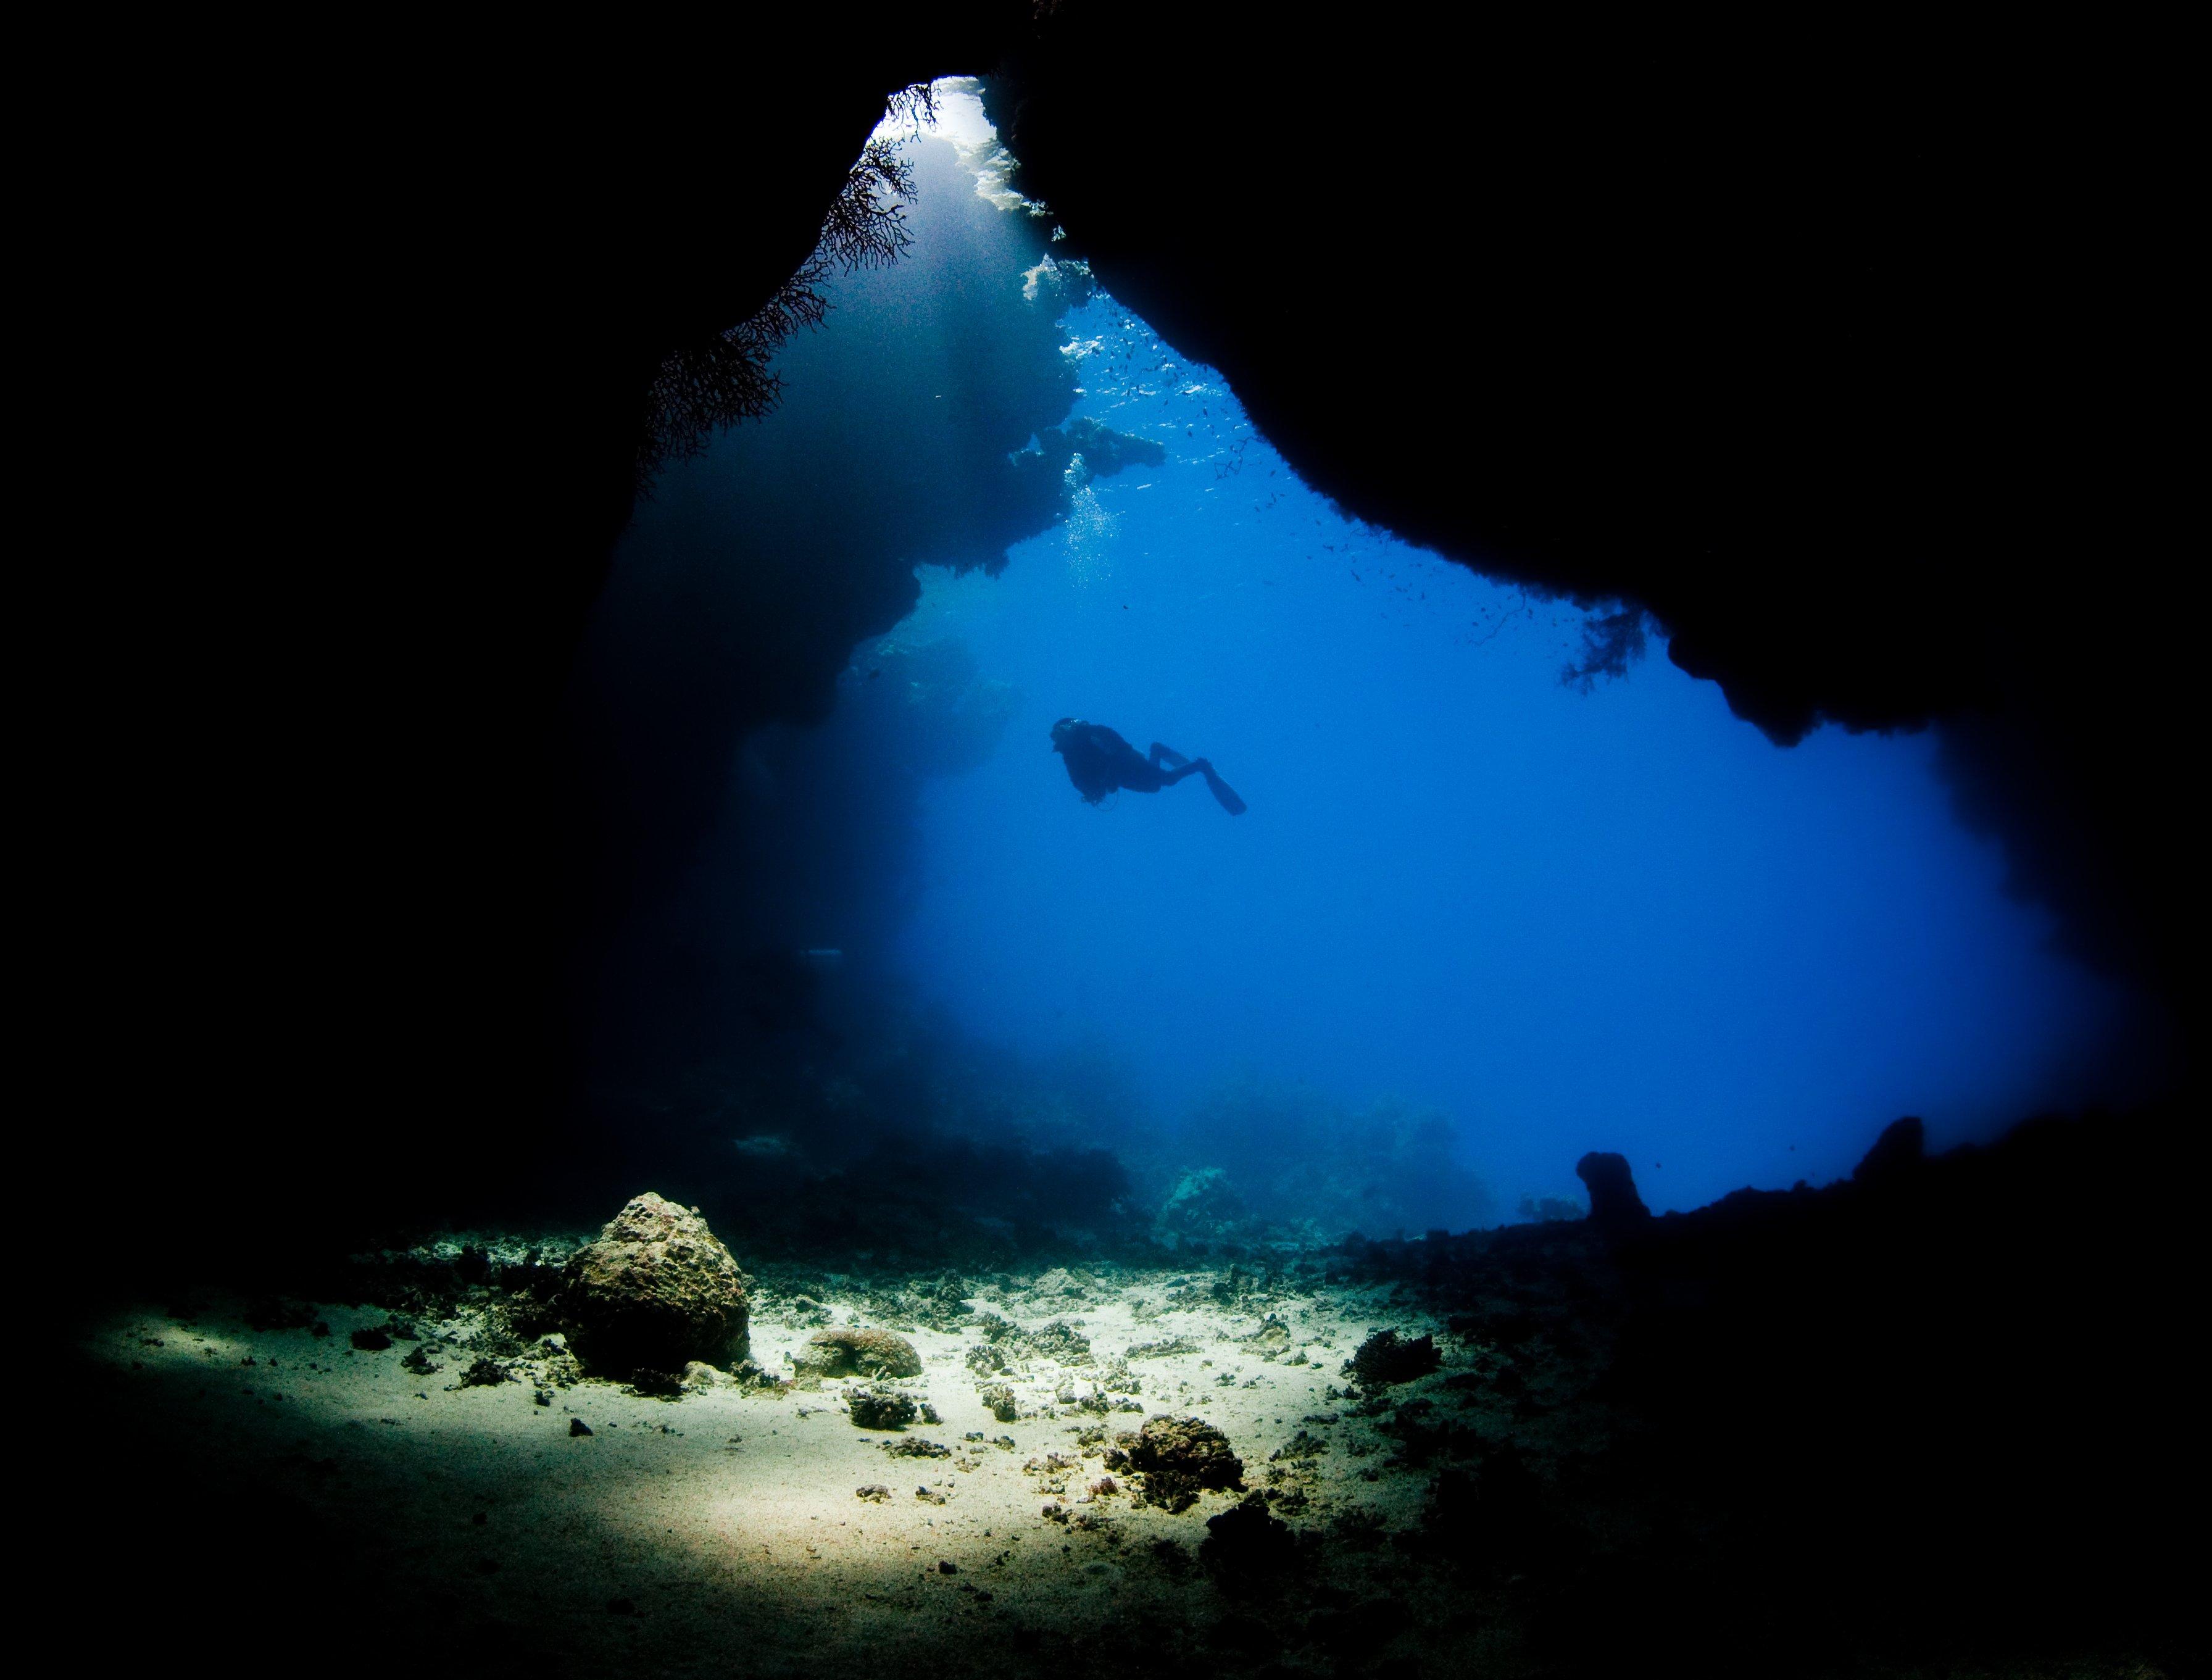 scuba diving wallpaper wallpapers - photo #23